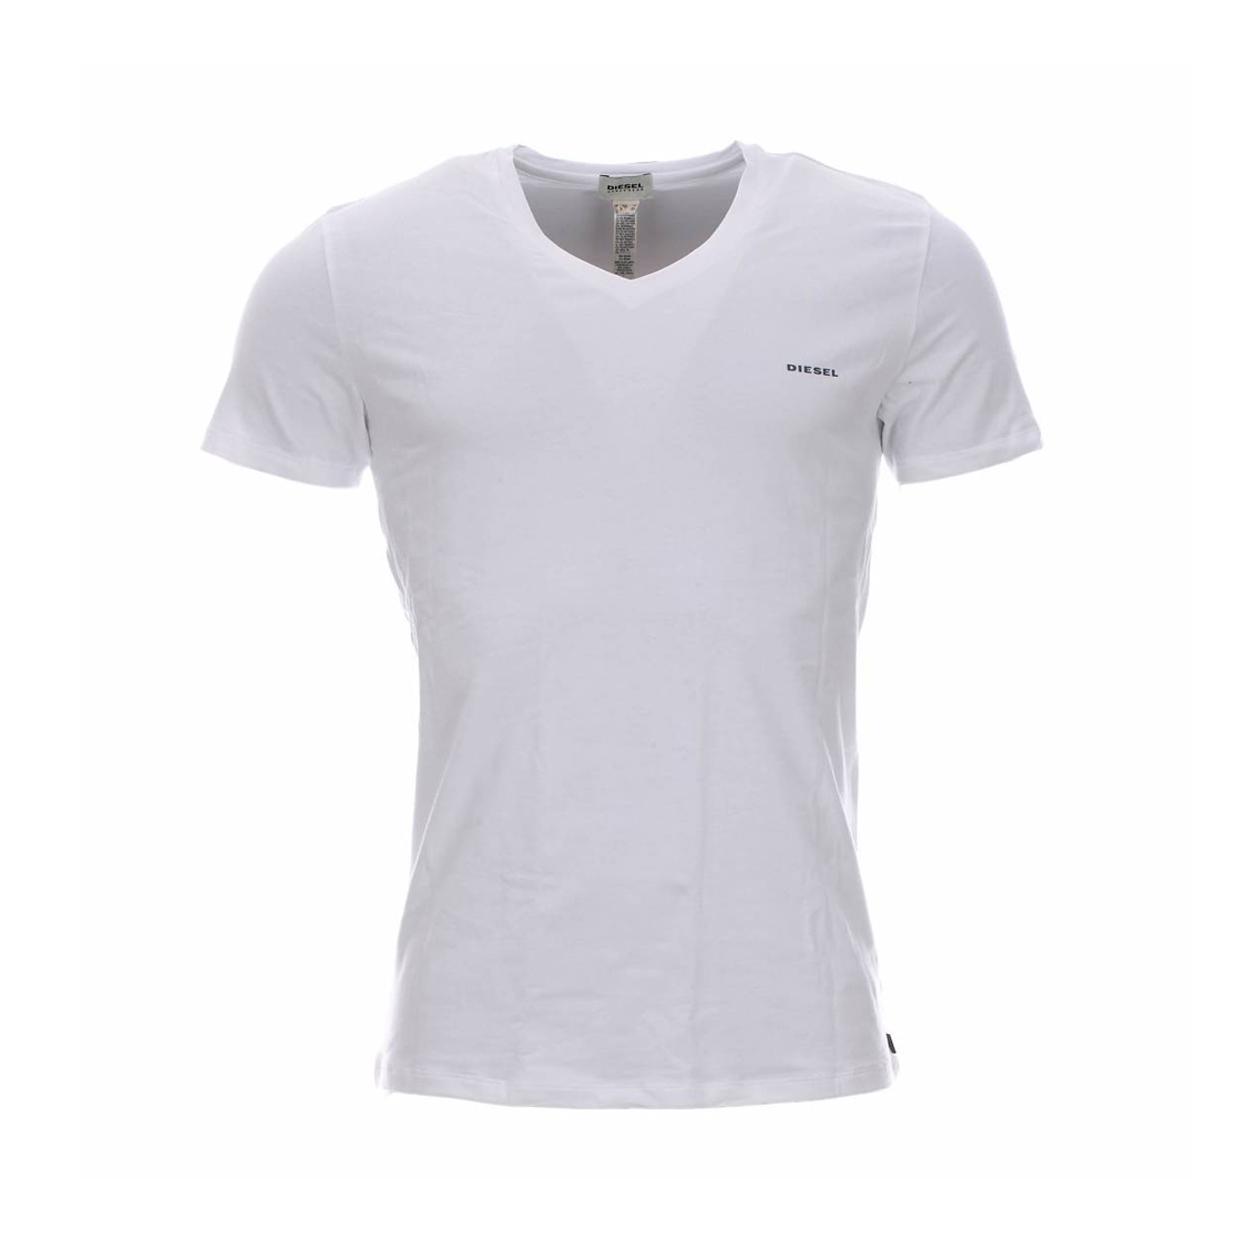 Tee-shirt diesel col v en coton stretch blanc